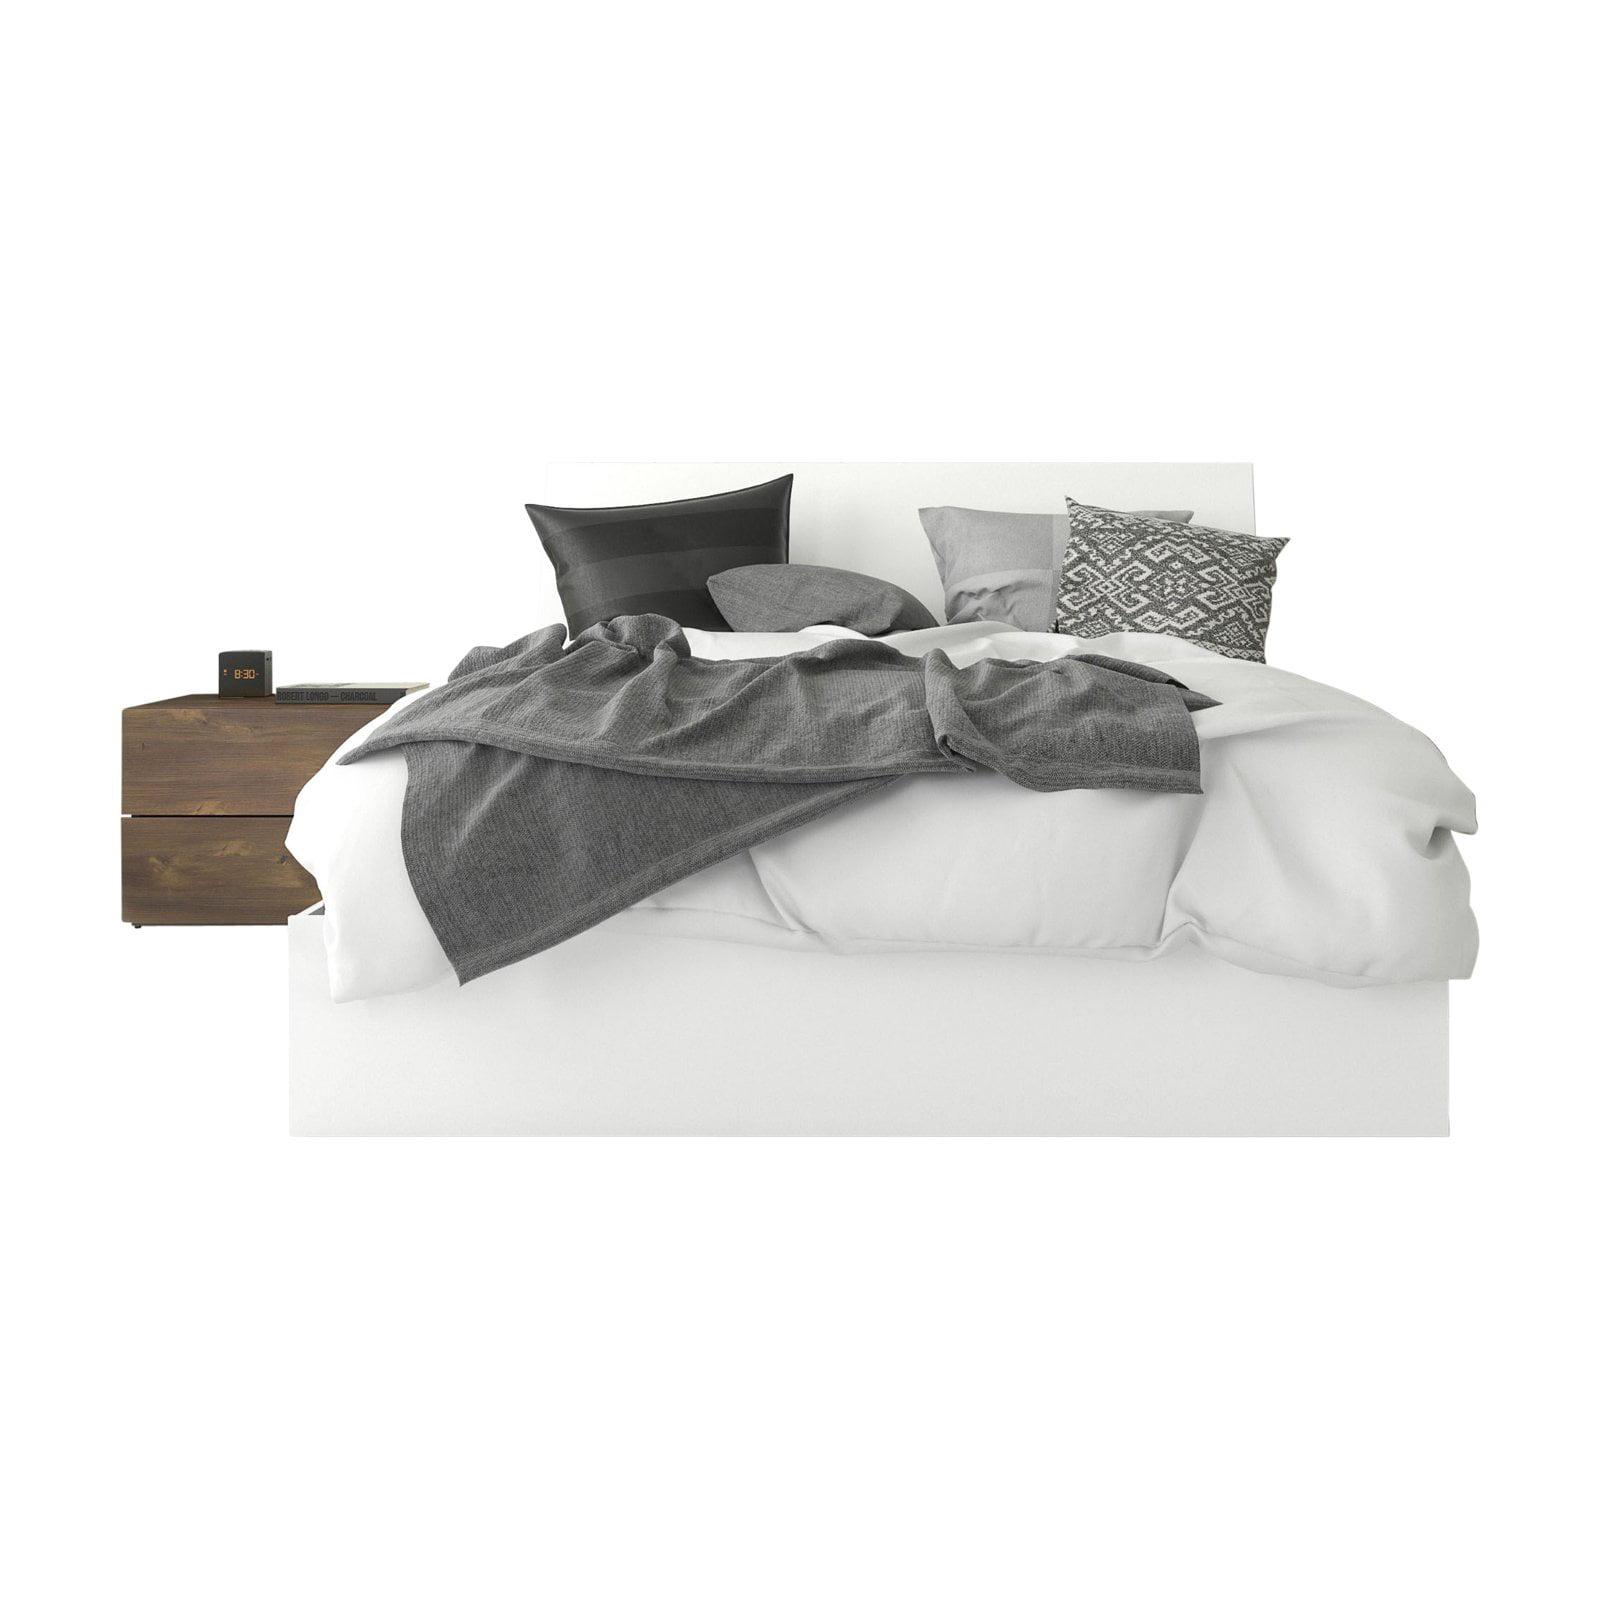 Nexera Compass Platform Storage Bed with Nightstand by Nexera